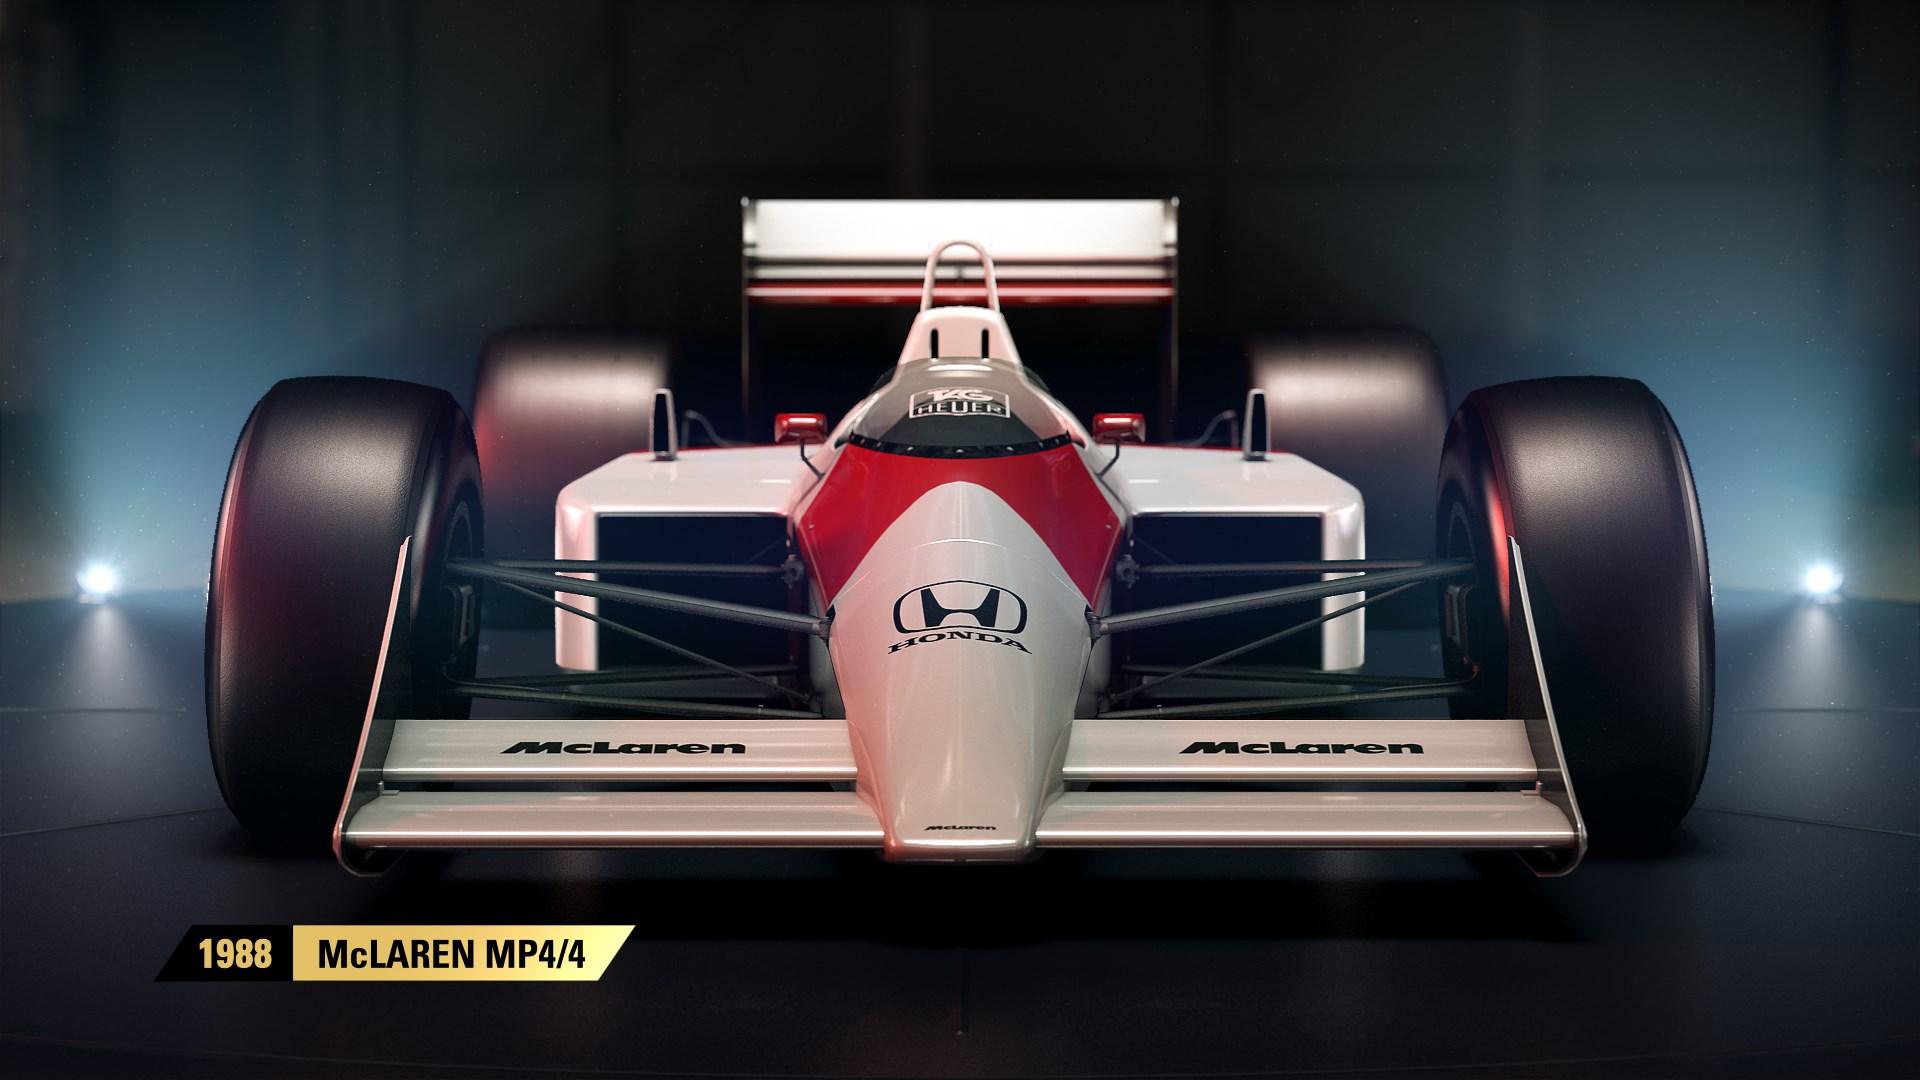 F1 2017 - Der legendäre 1988er McLaren MP4/4.